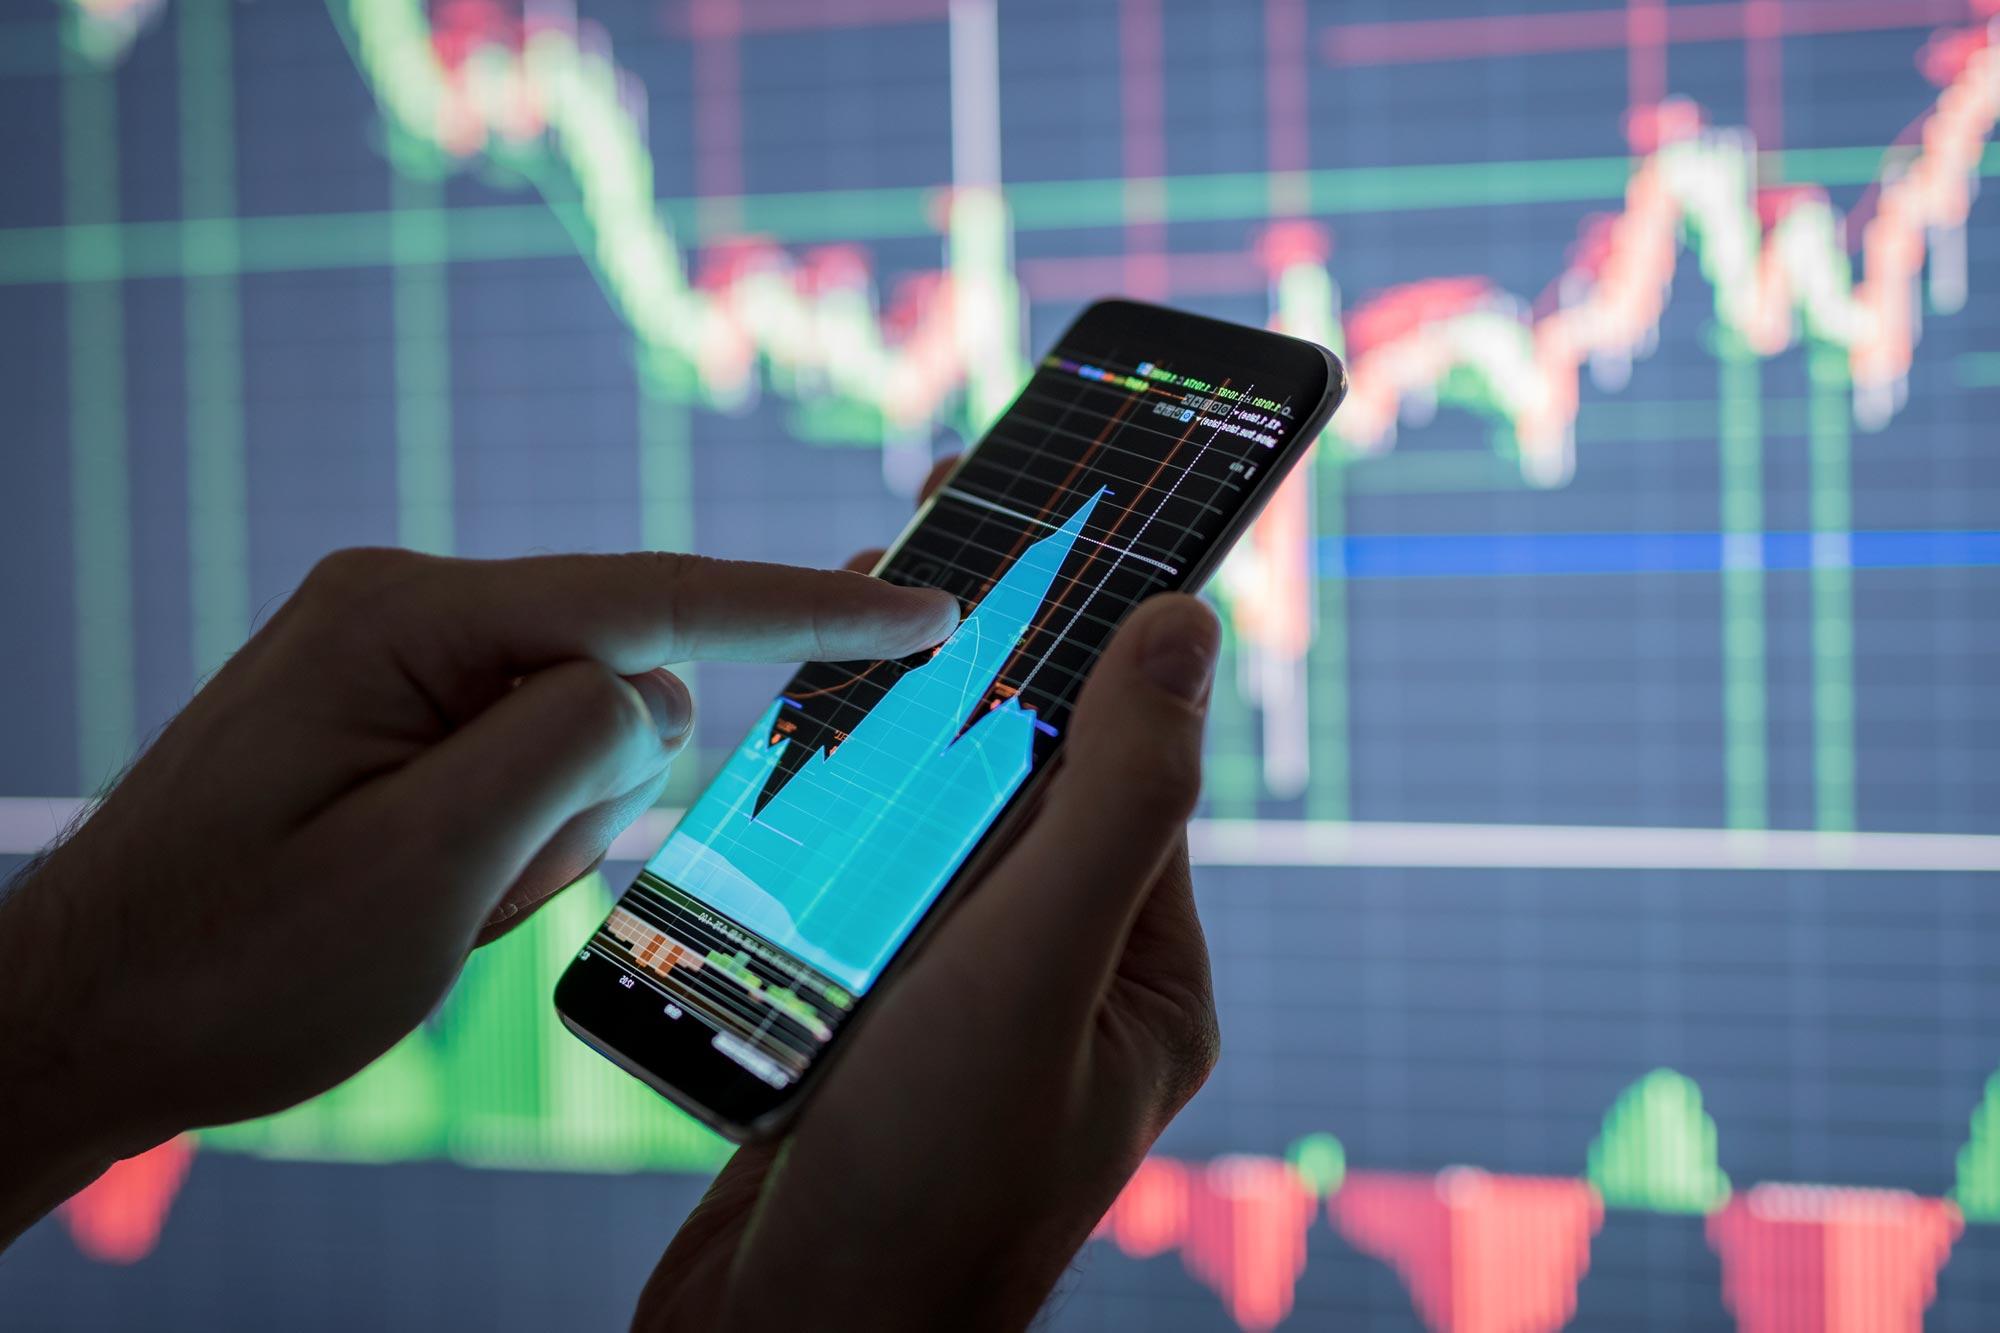 la mejor app para invertir en bolsa